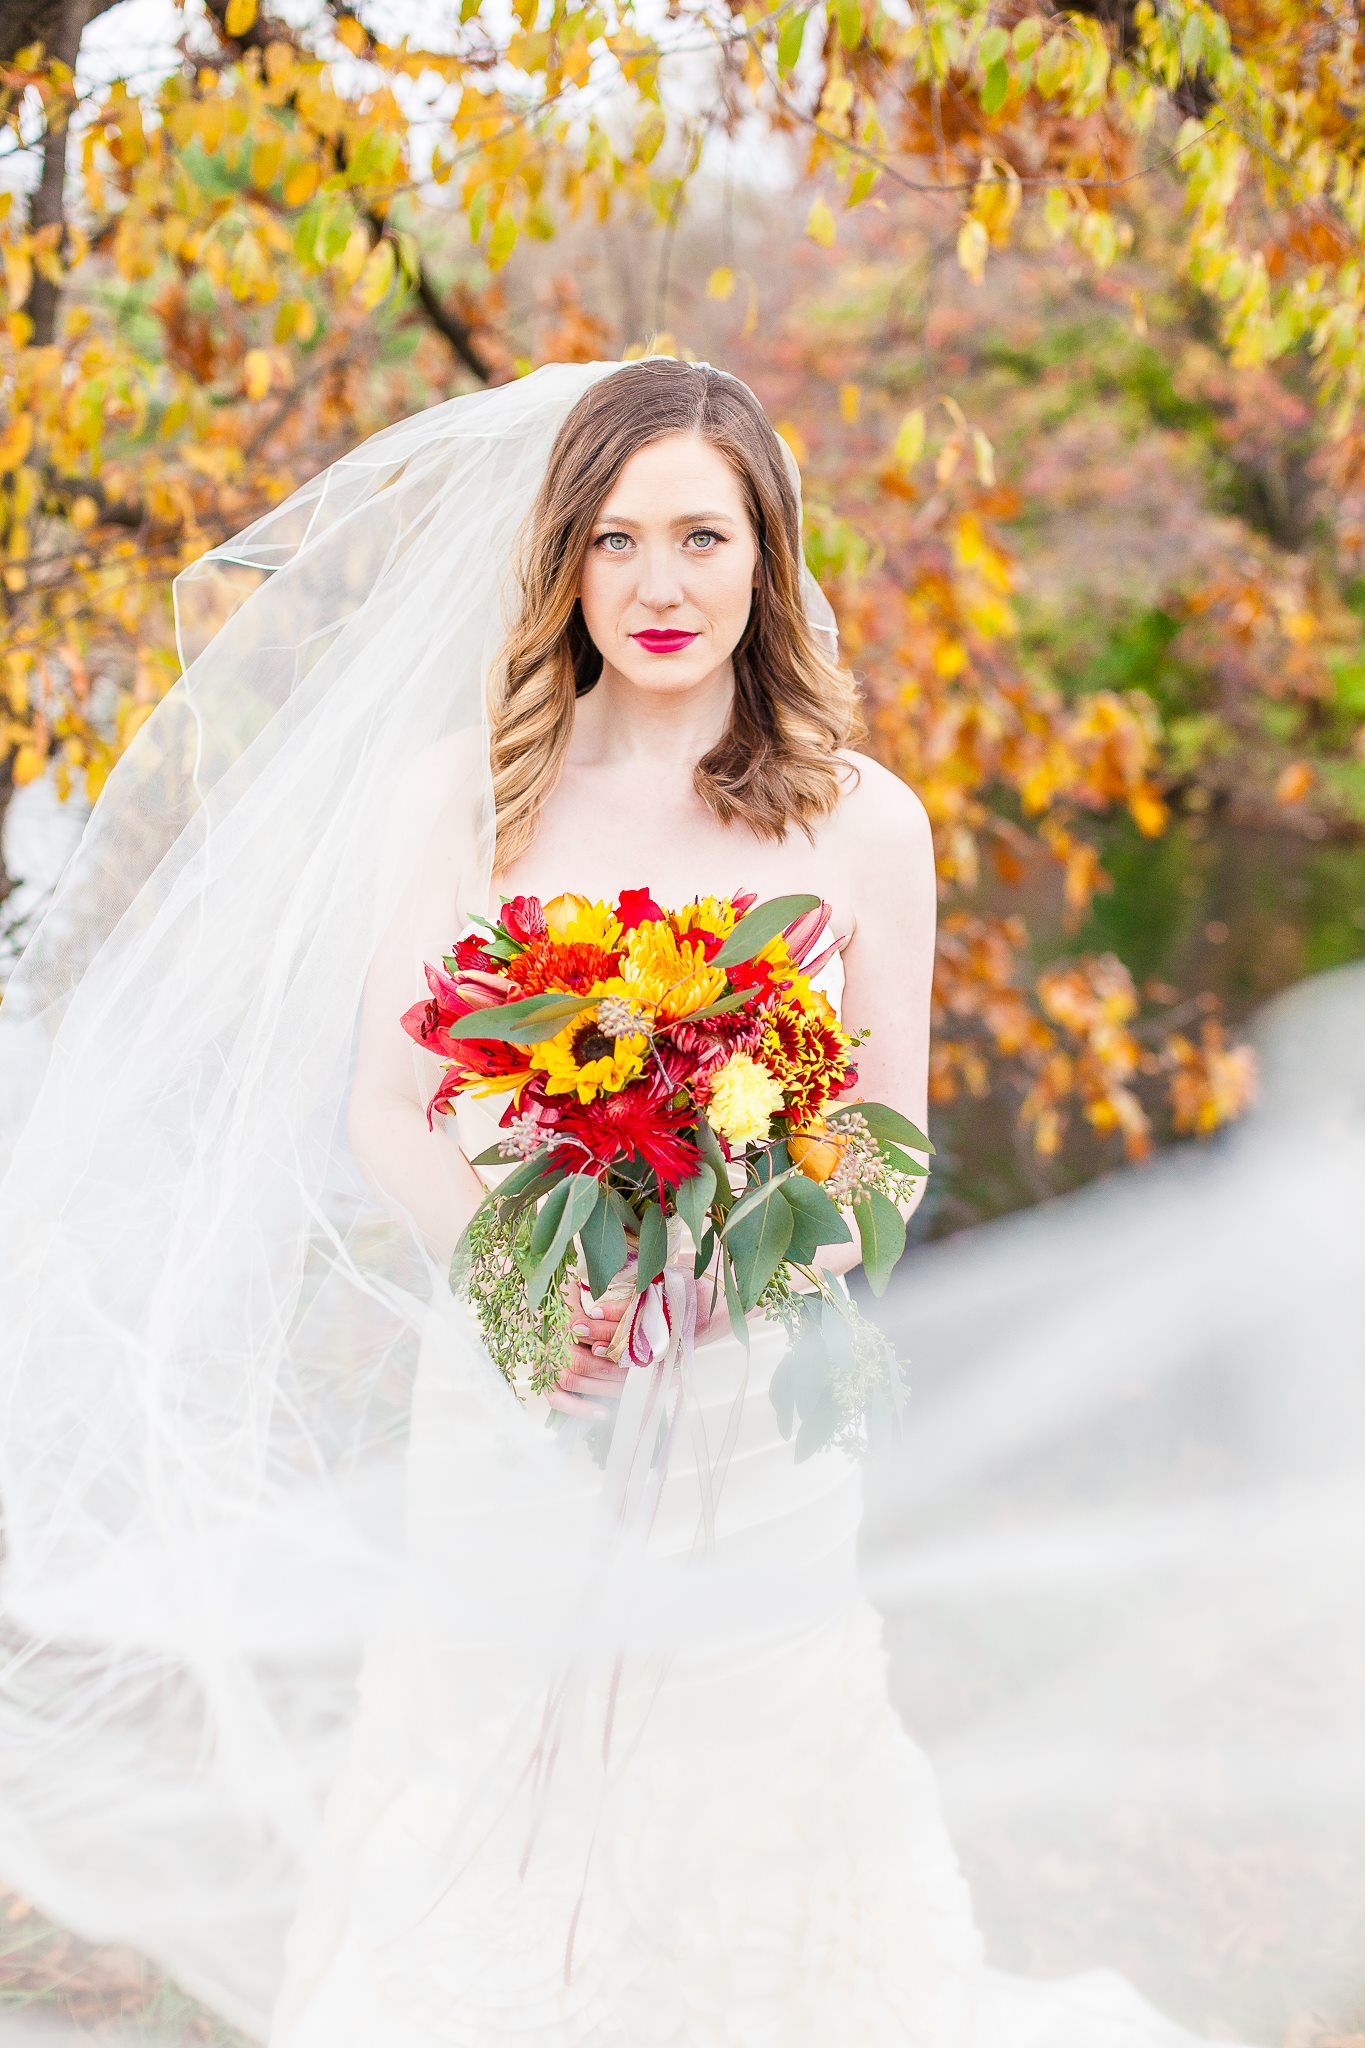 ACStudio_Styled_Autumn-Bride (4).jpg